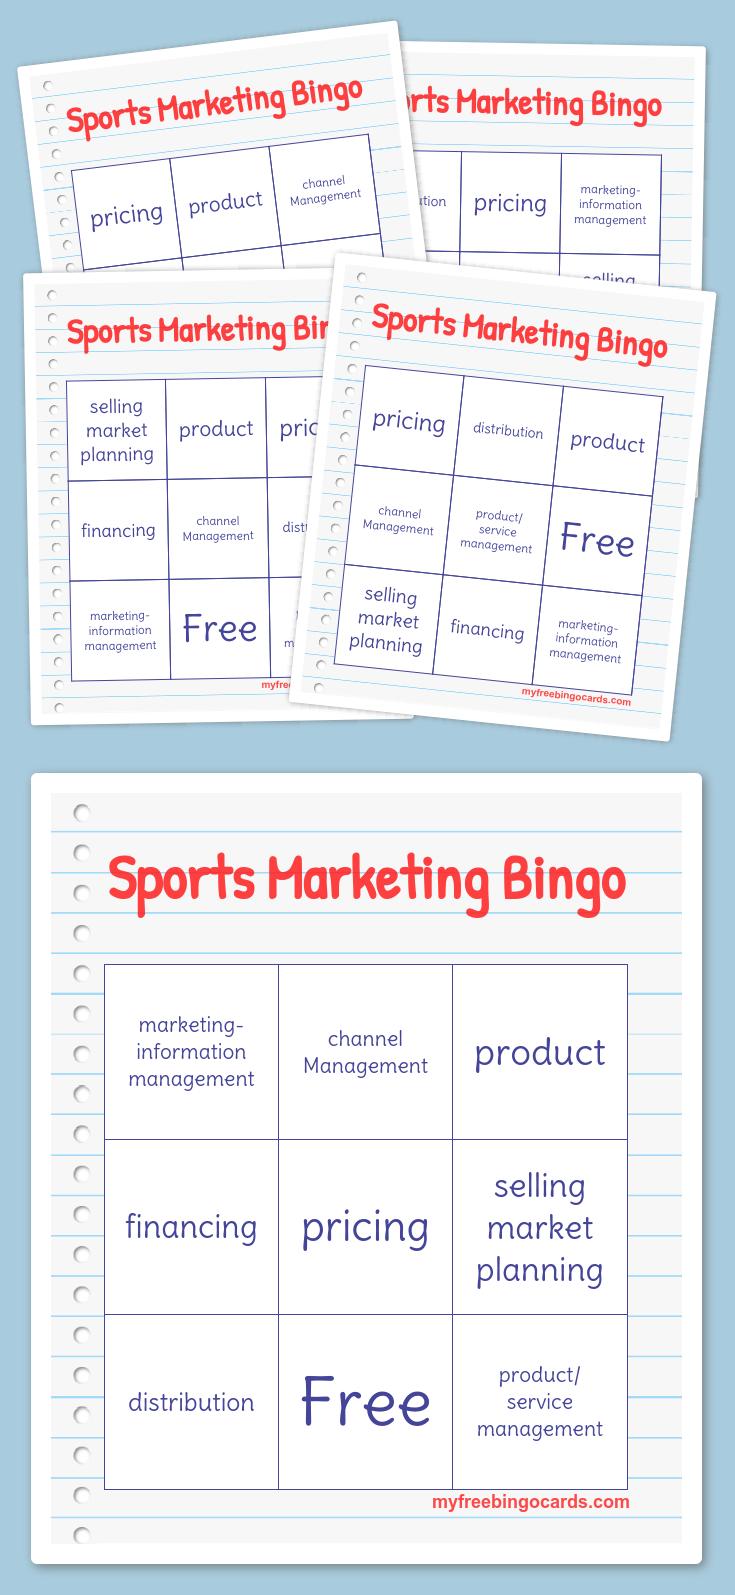 Free Printable Bingo Cards Bingo cards, Bingo card